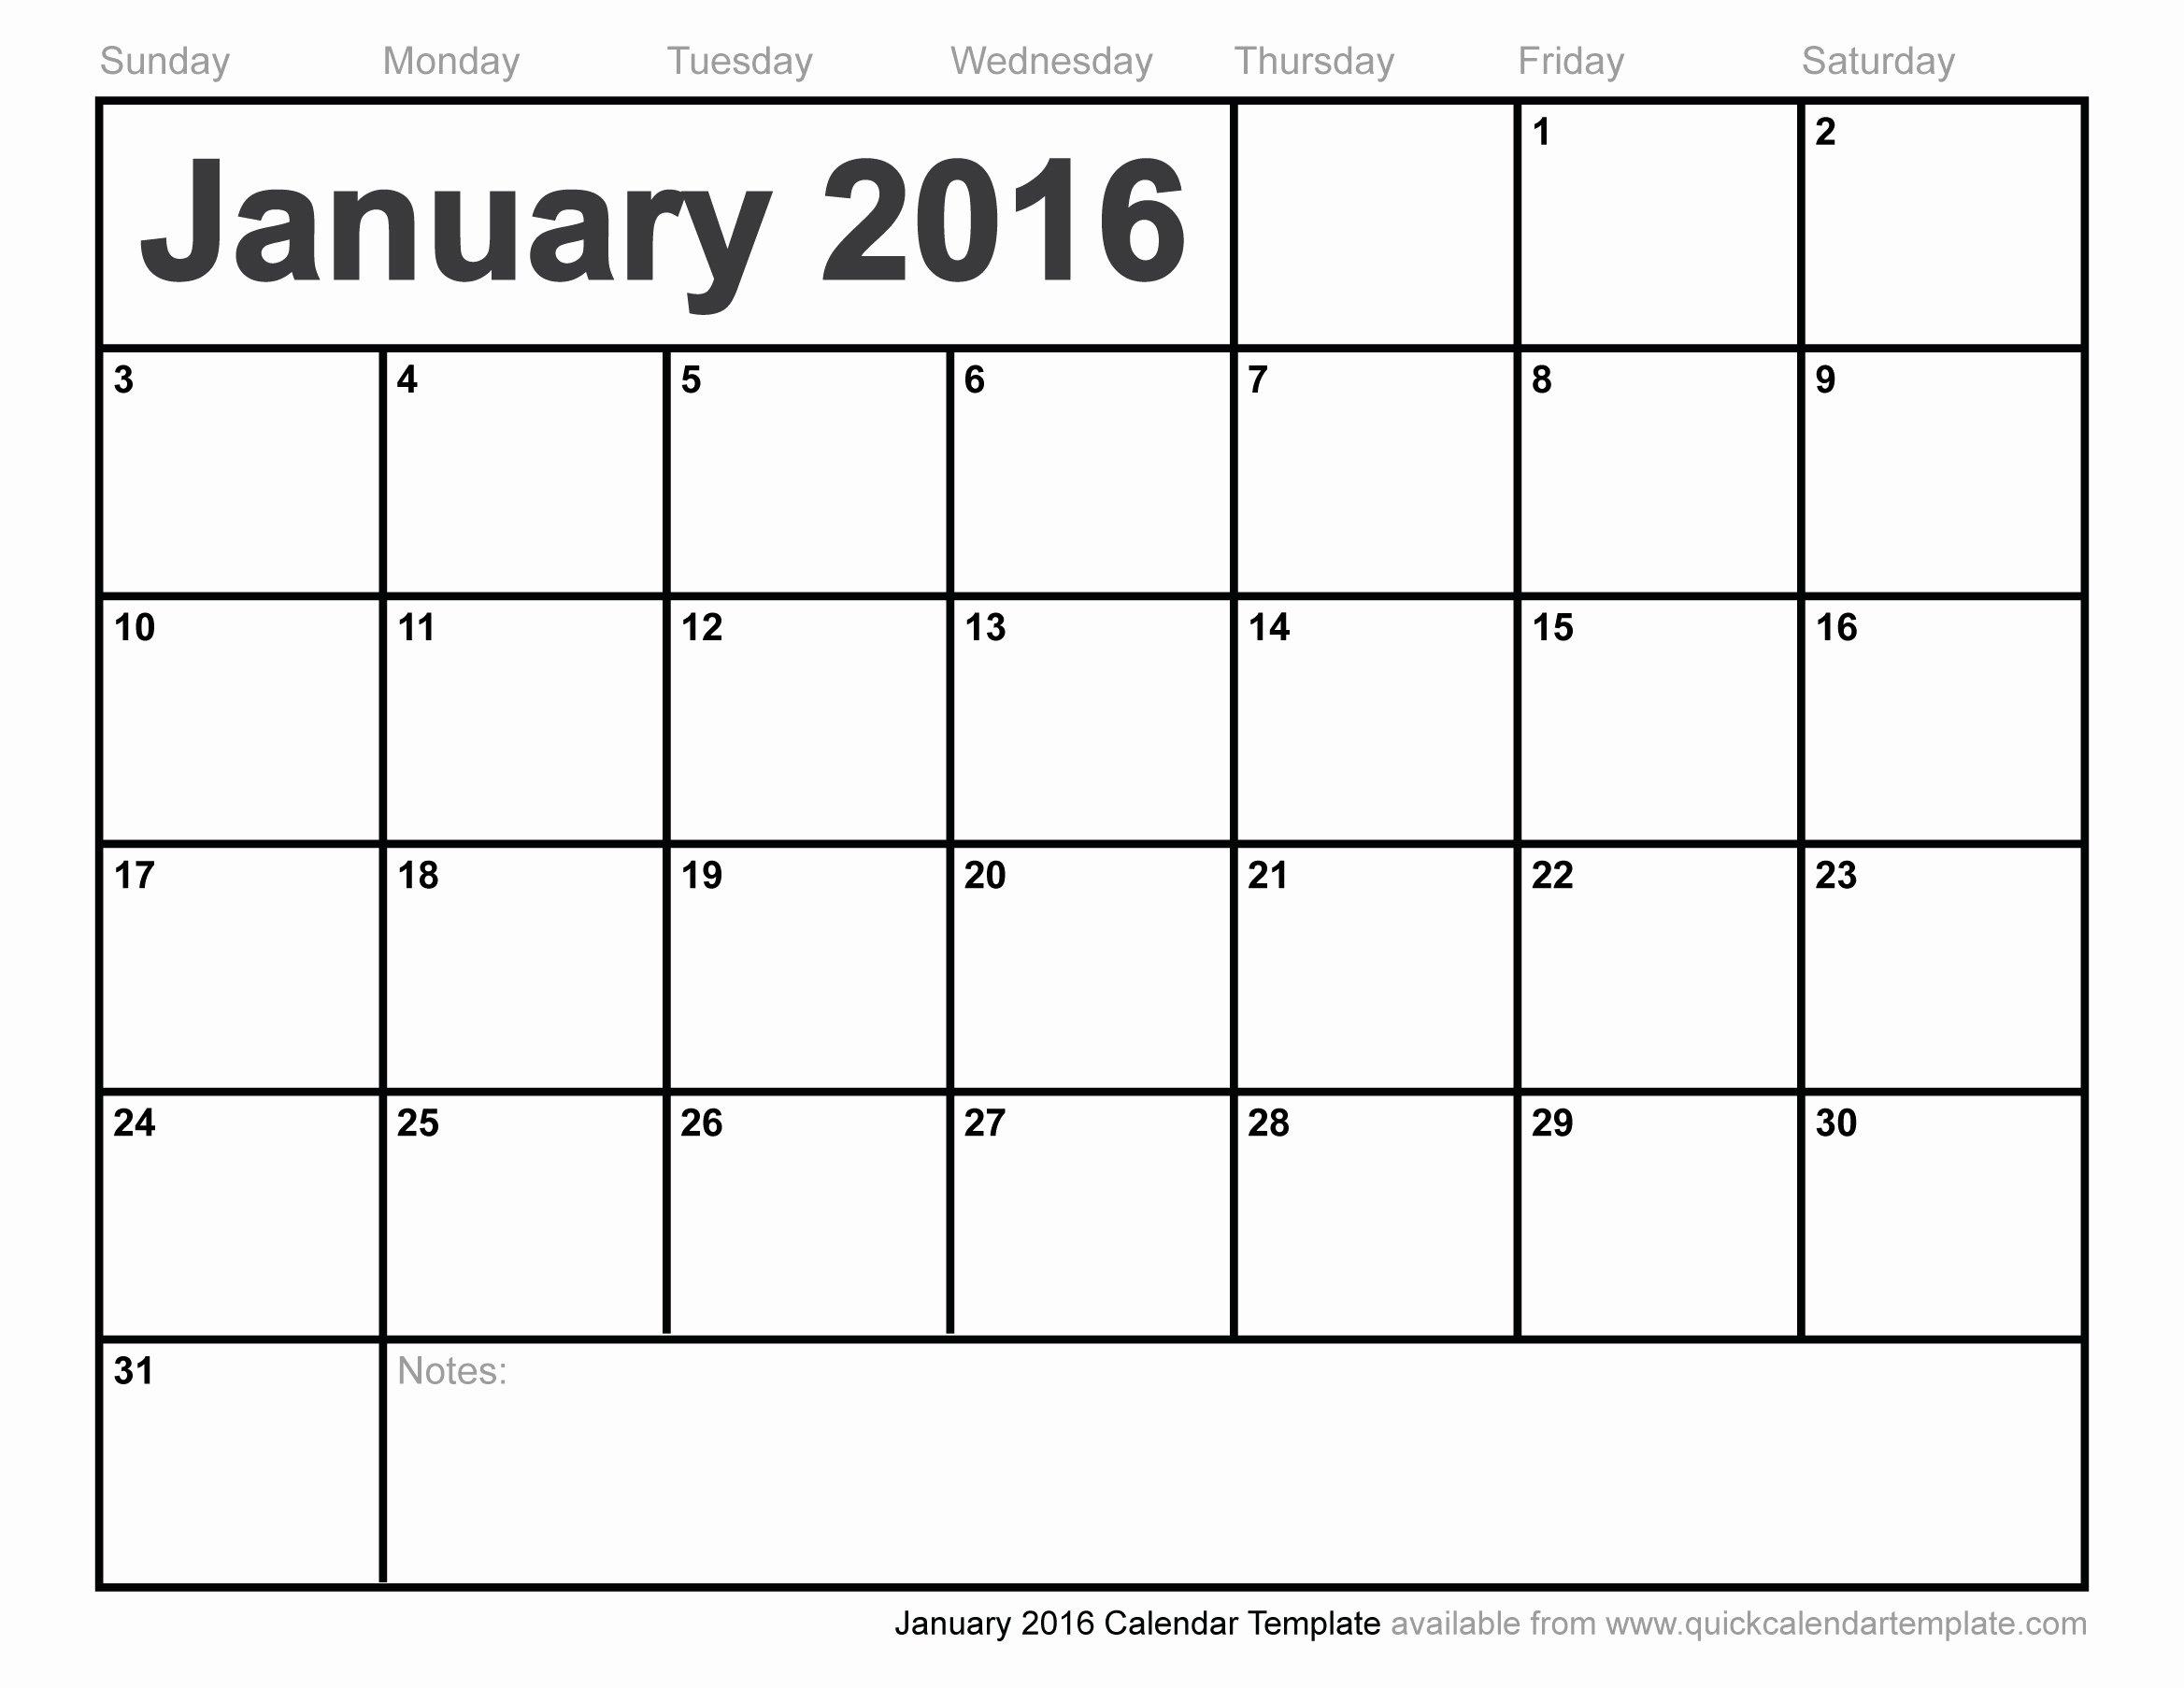 January 2016 Calendar Template